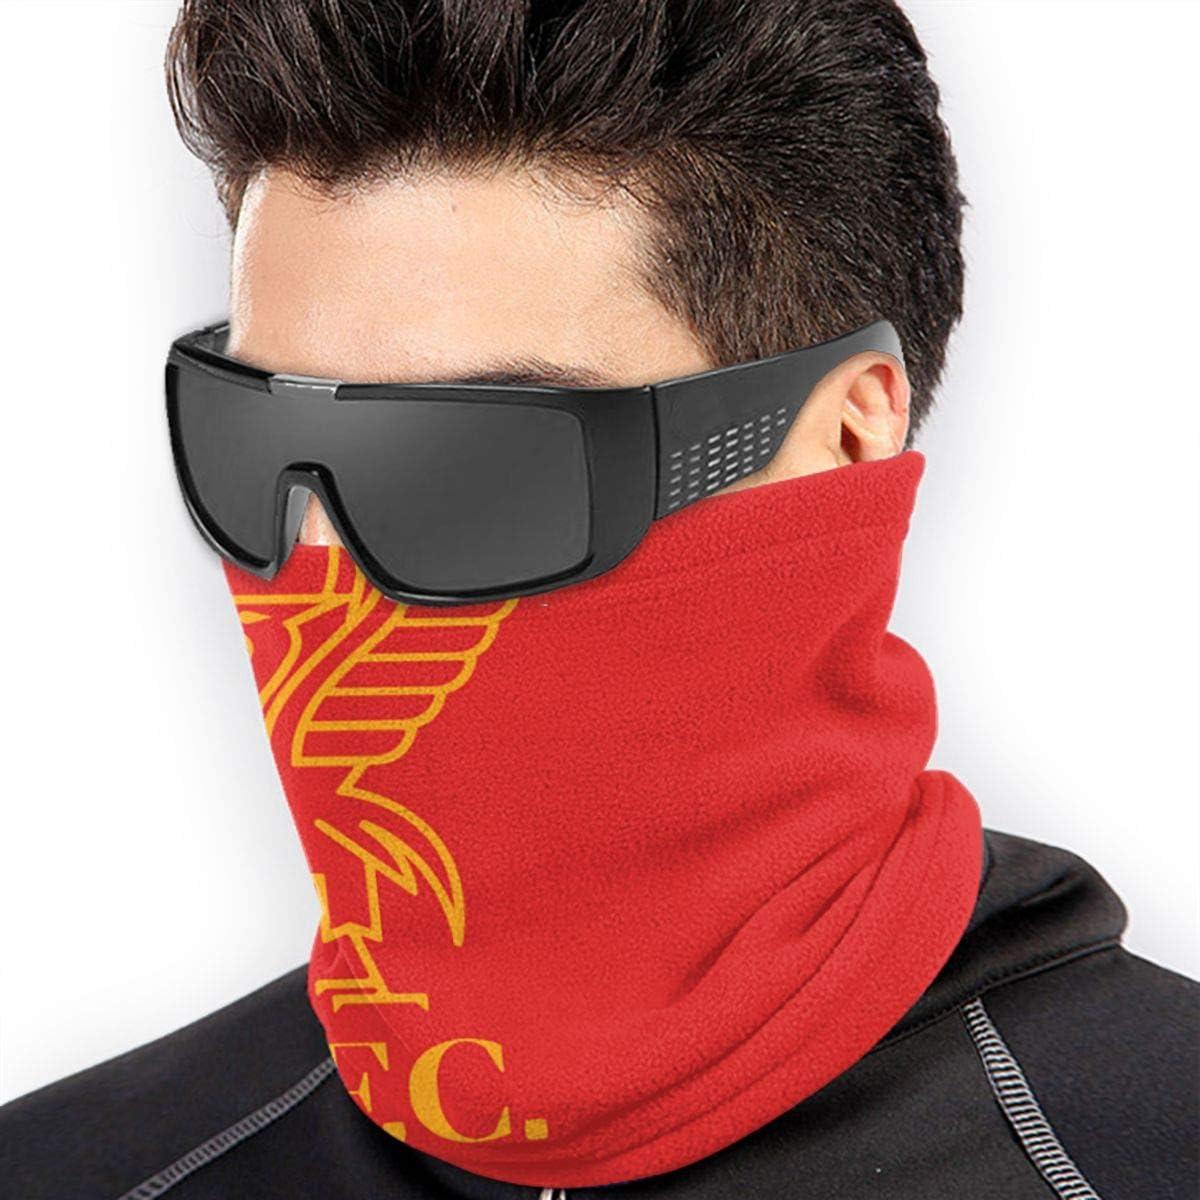 RITWING Live/_rpool F/_C Microfiber Neck Warmer Scarf Gaiter Headwear Face Sh/_ield